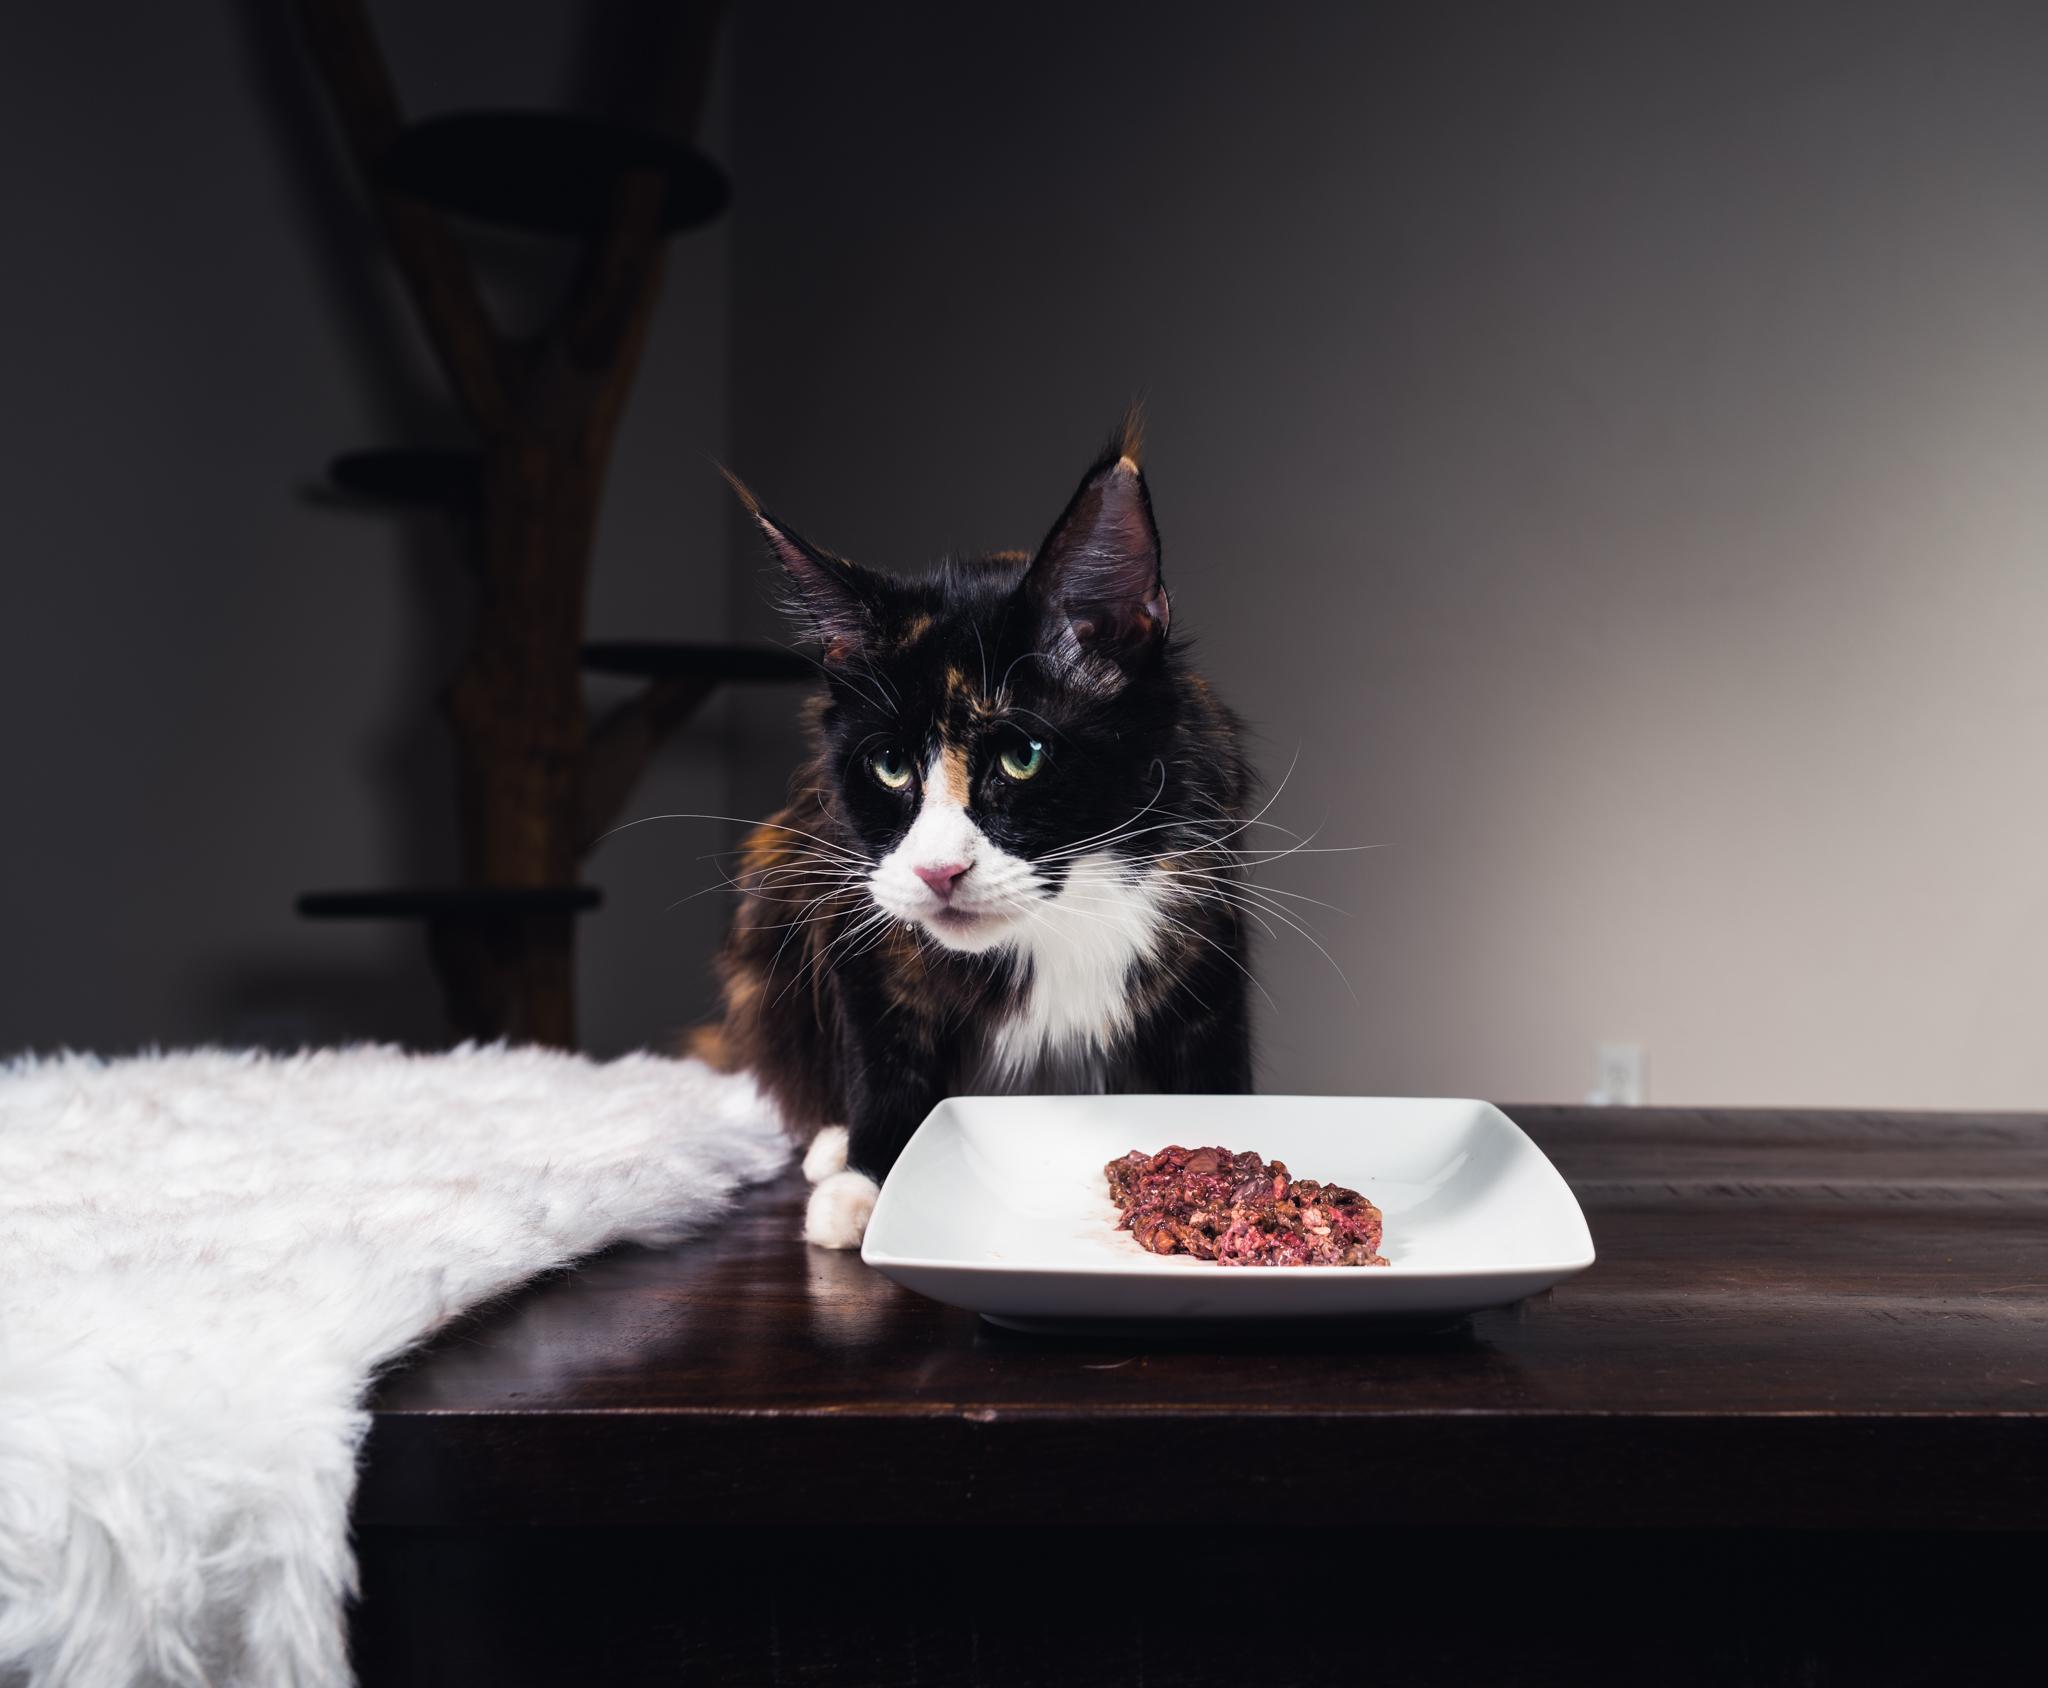 Beef_lung_cats_2048_12.JPG